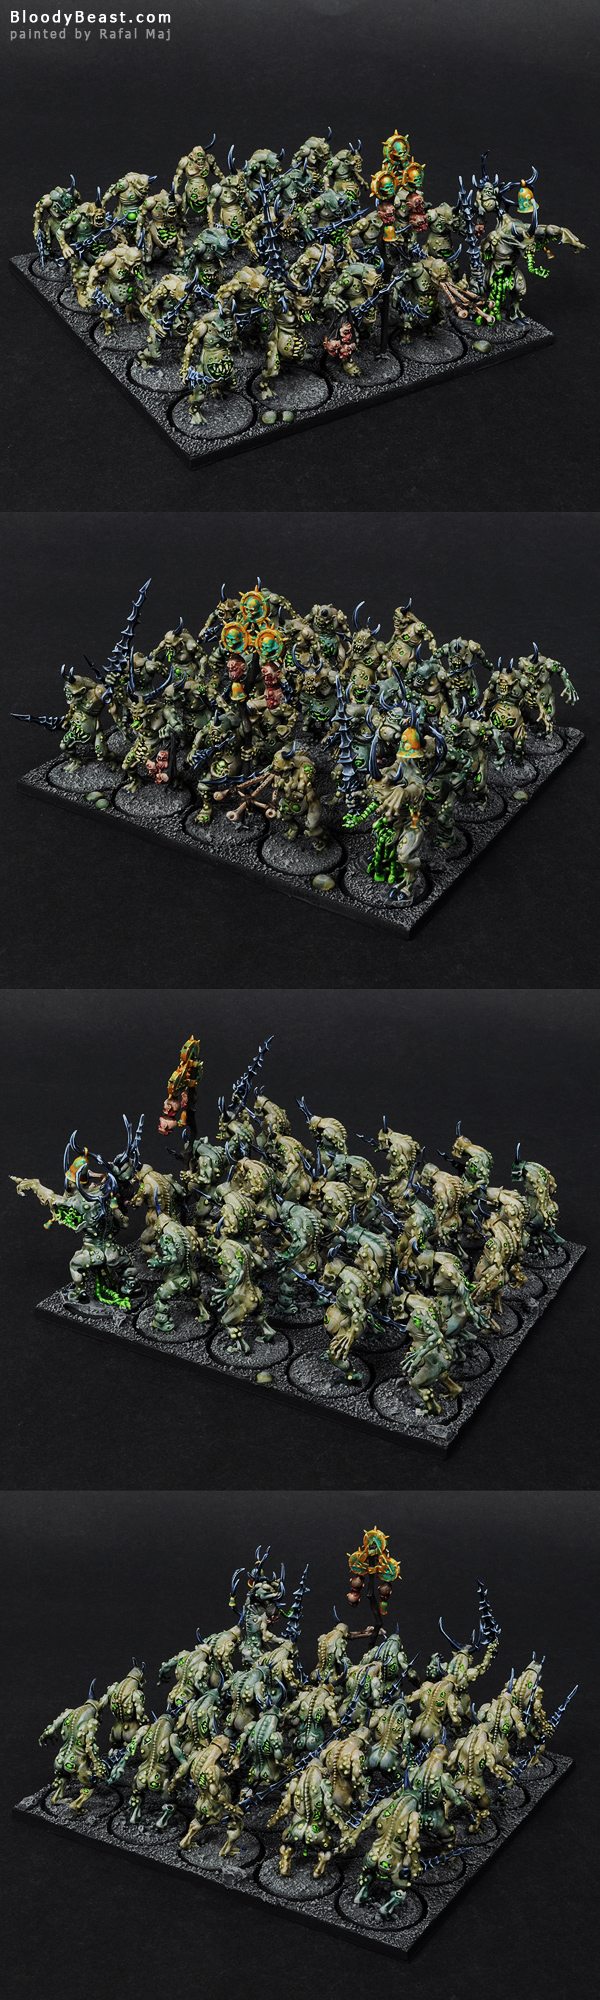 Plaguebearers of Nurgle painted by Rafal Maj (BloodyBeast.com)